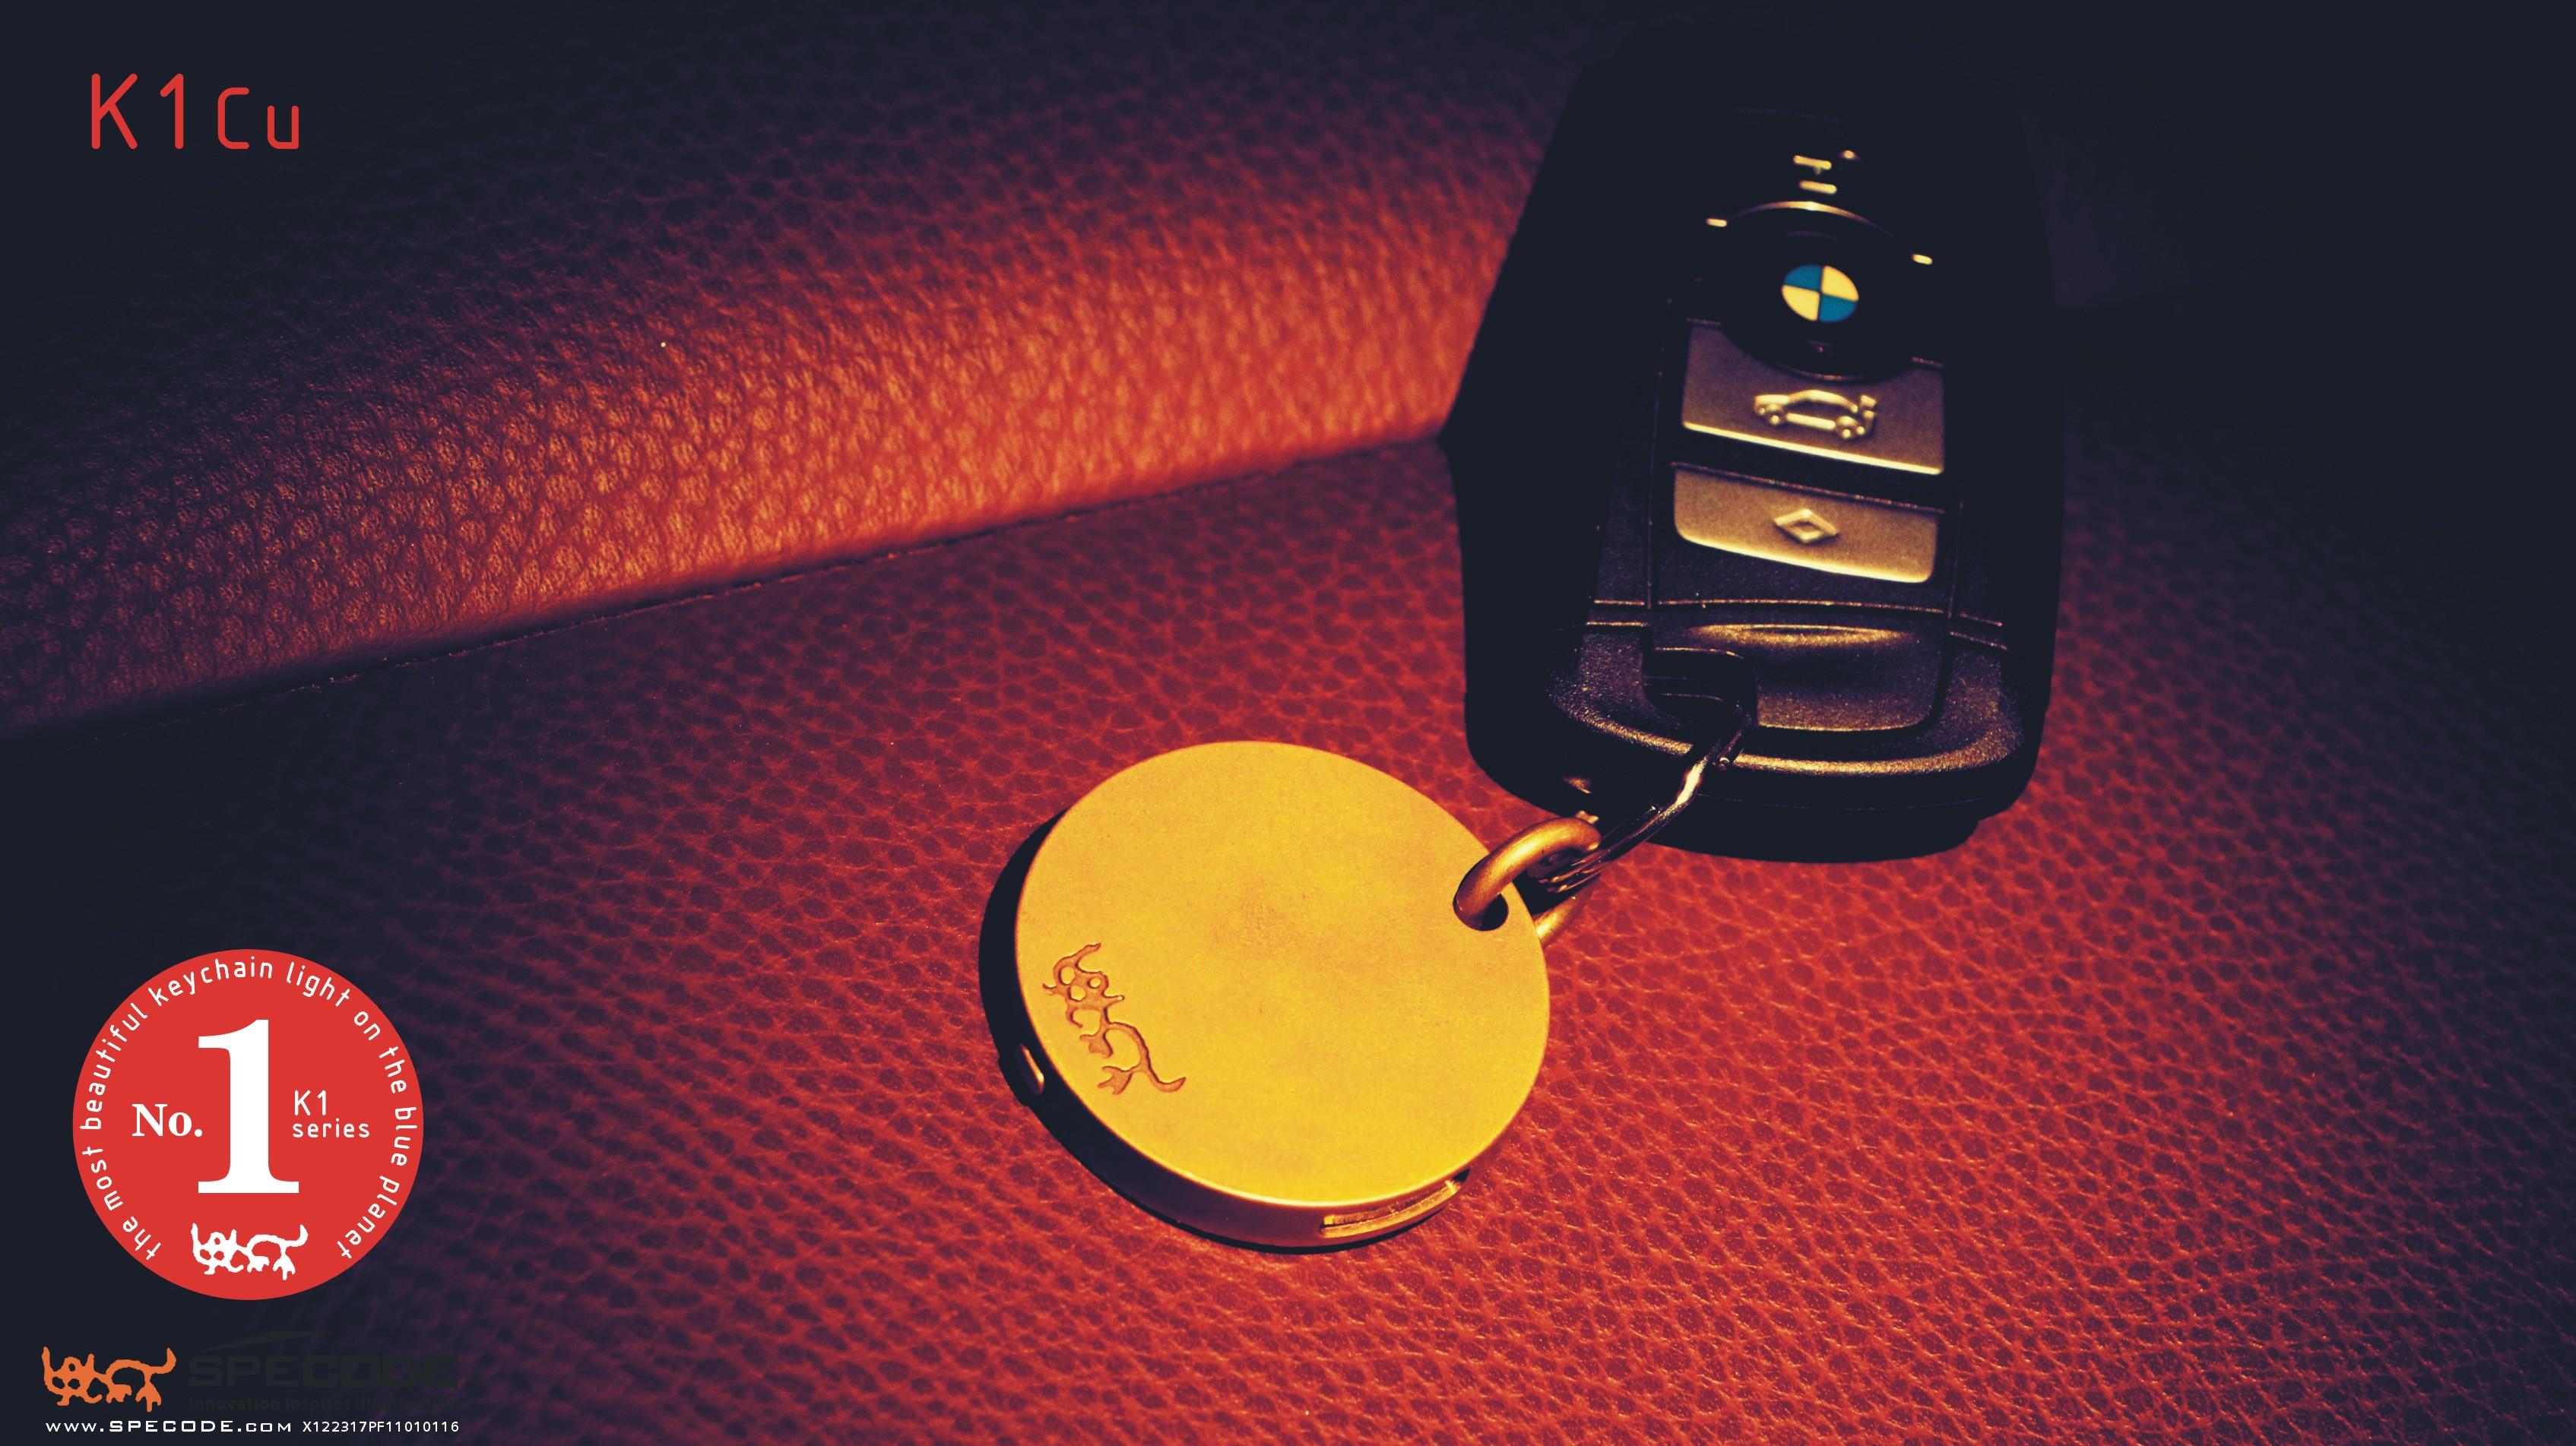 13171223SPECODEK1Cu-key